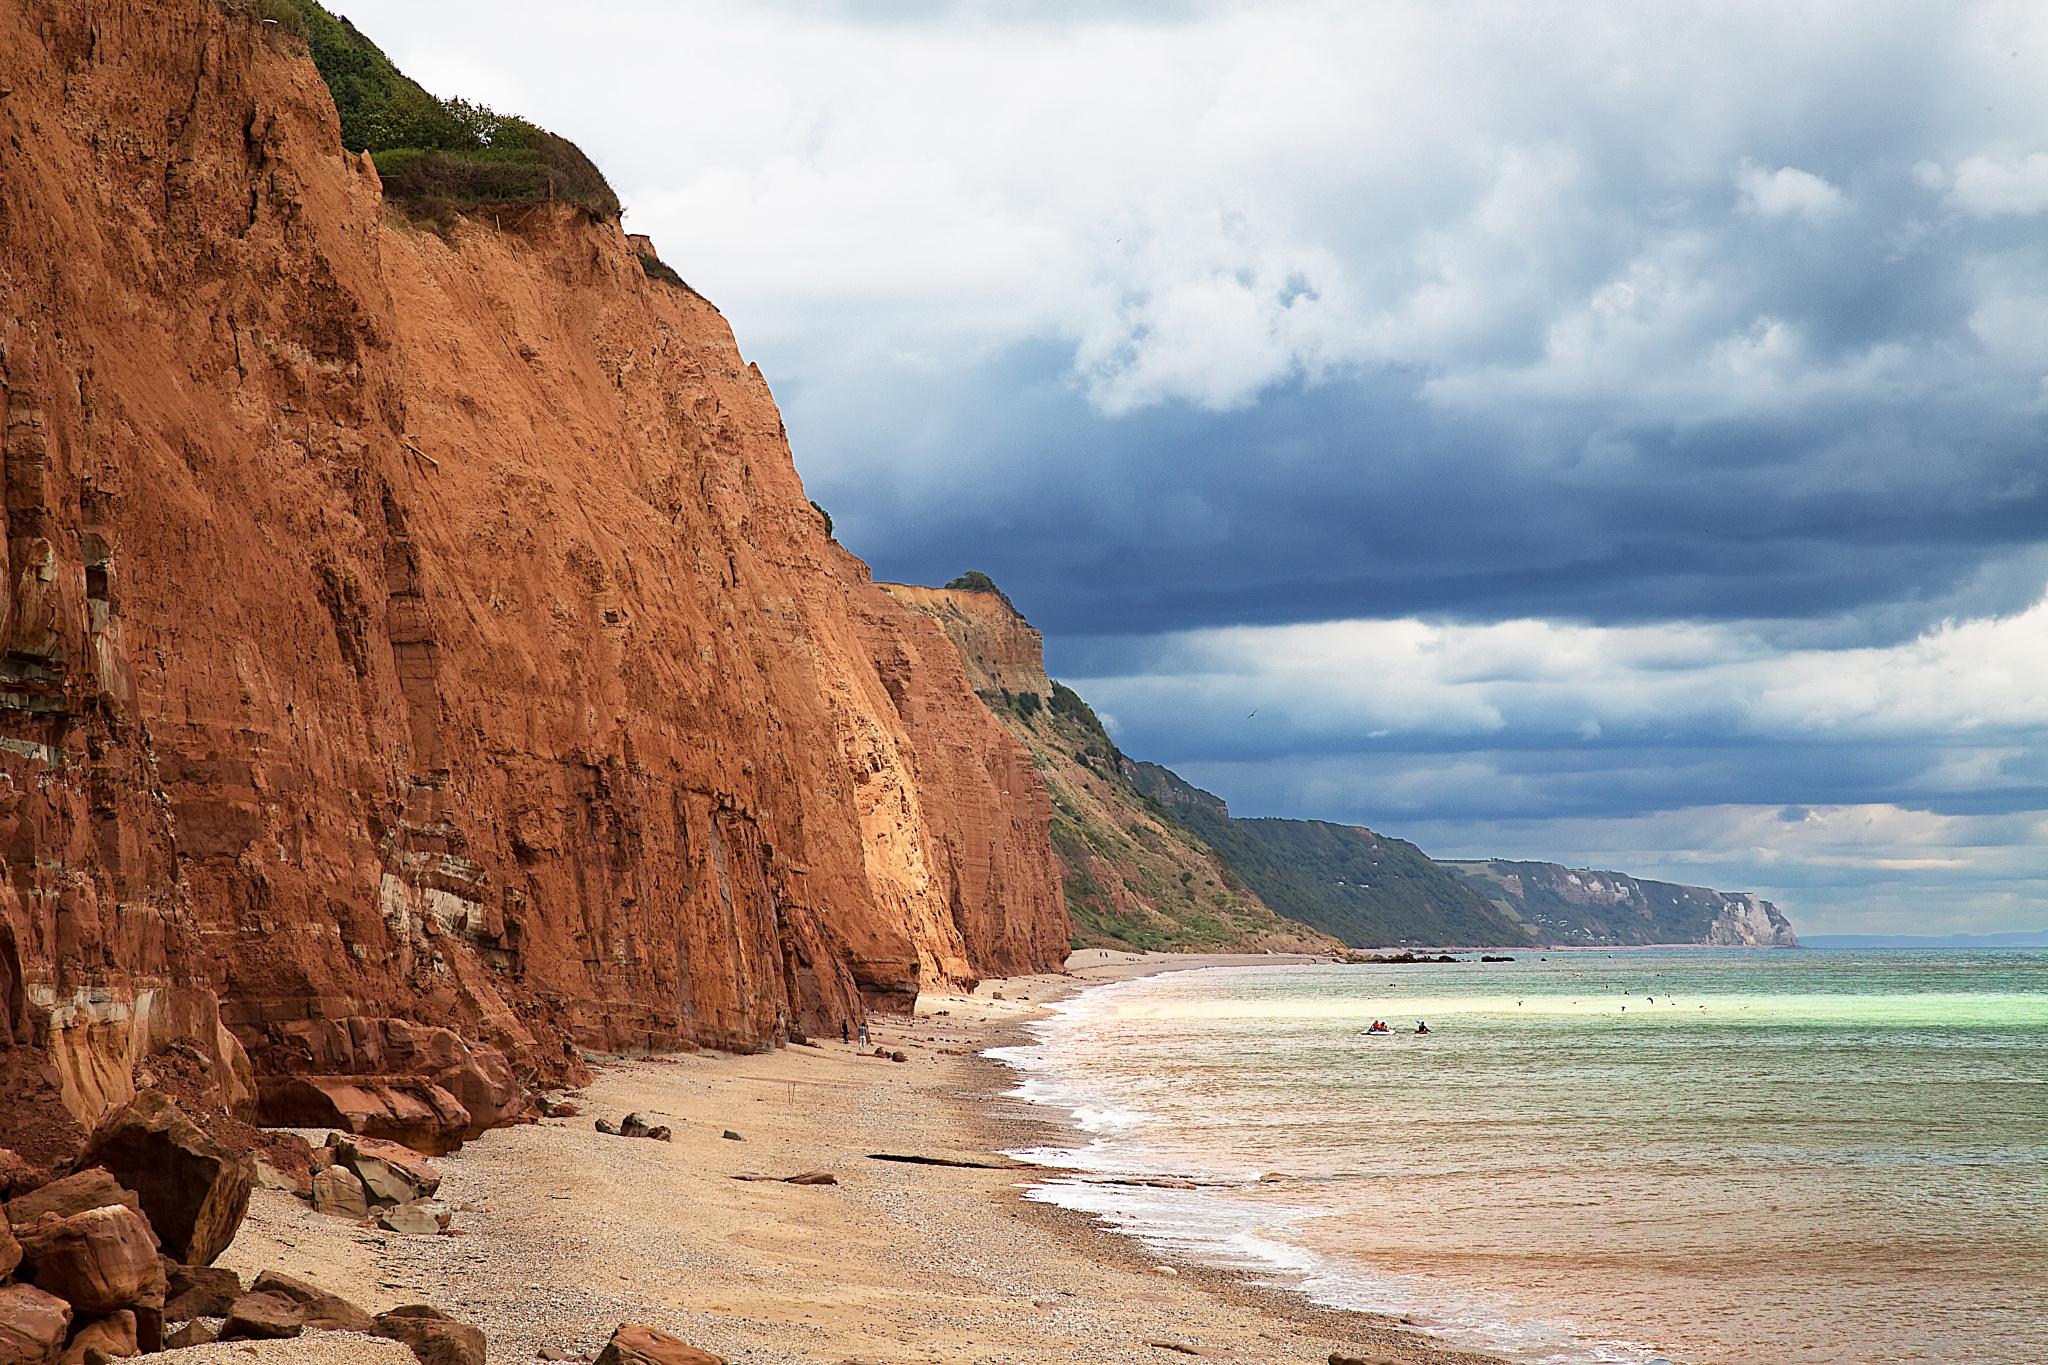 coast by Christoph Reiter